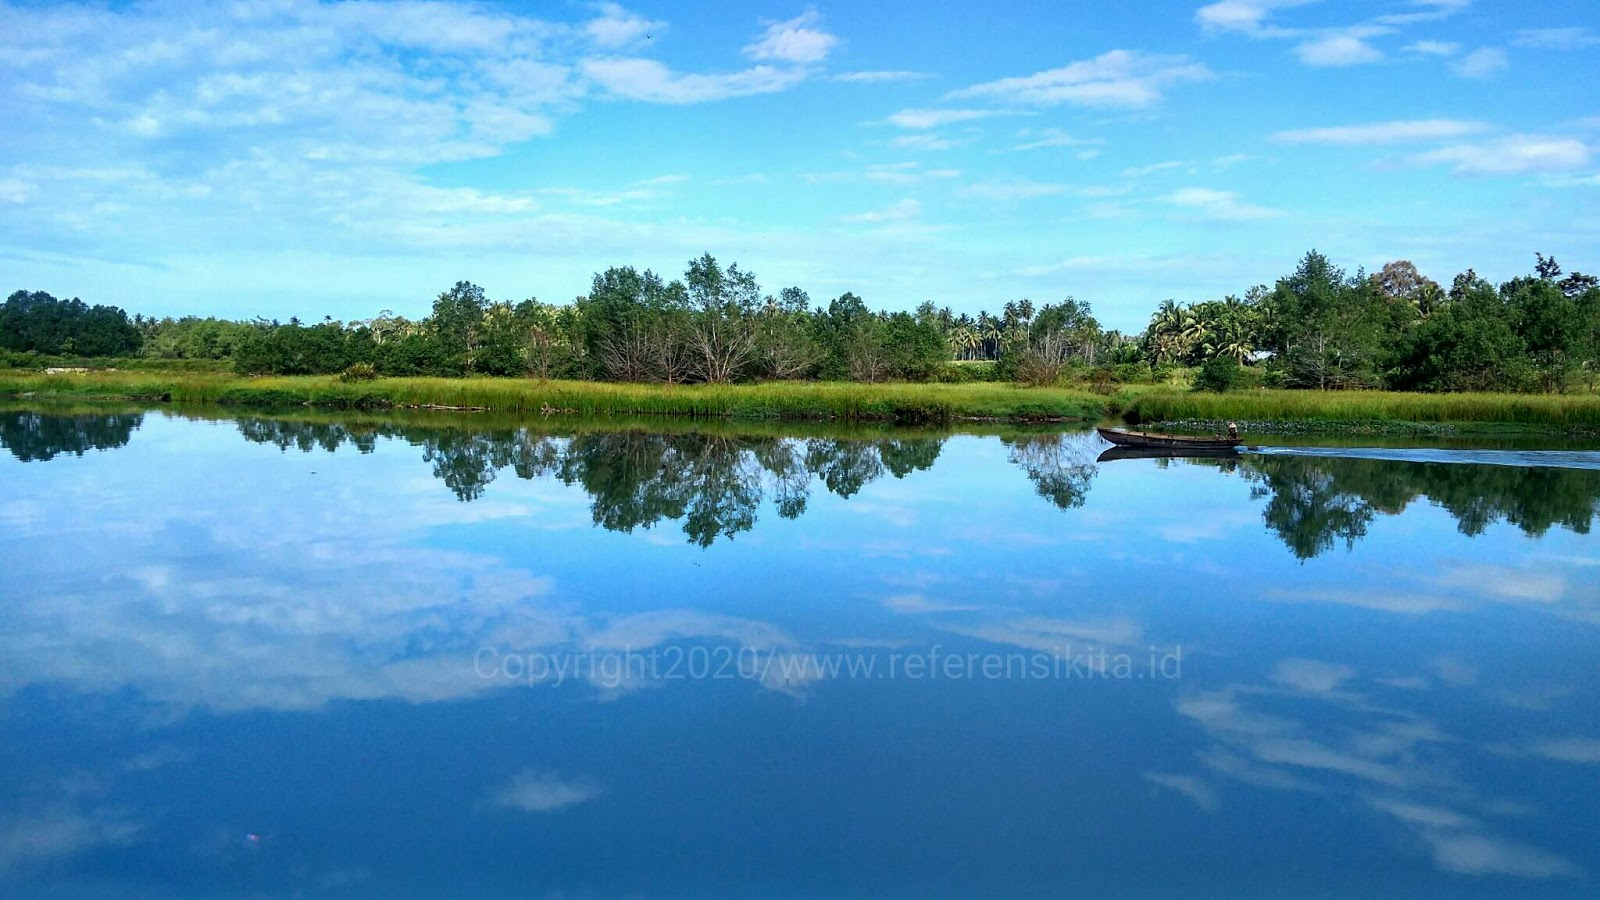 Tempat wisata Muaro Anai Padang Pariaman jadi pelabuhan